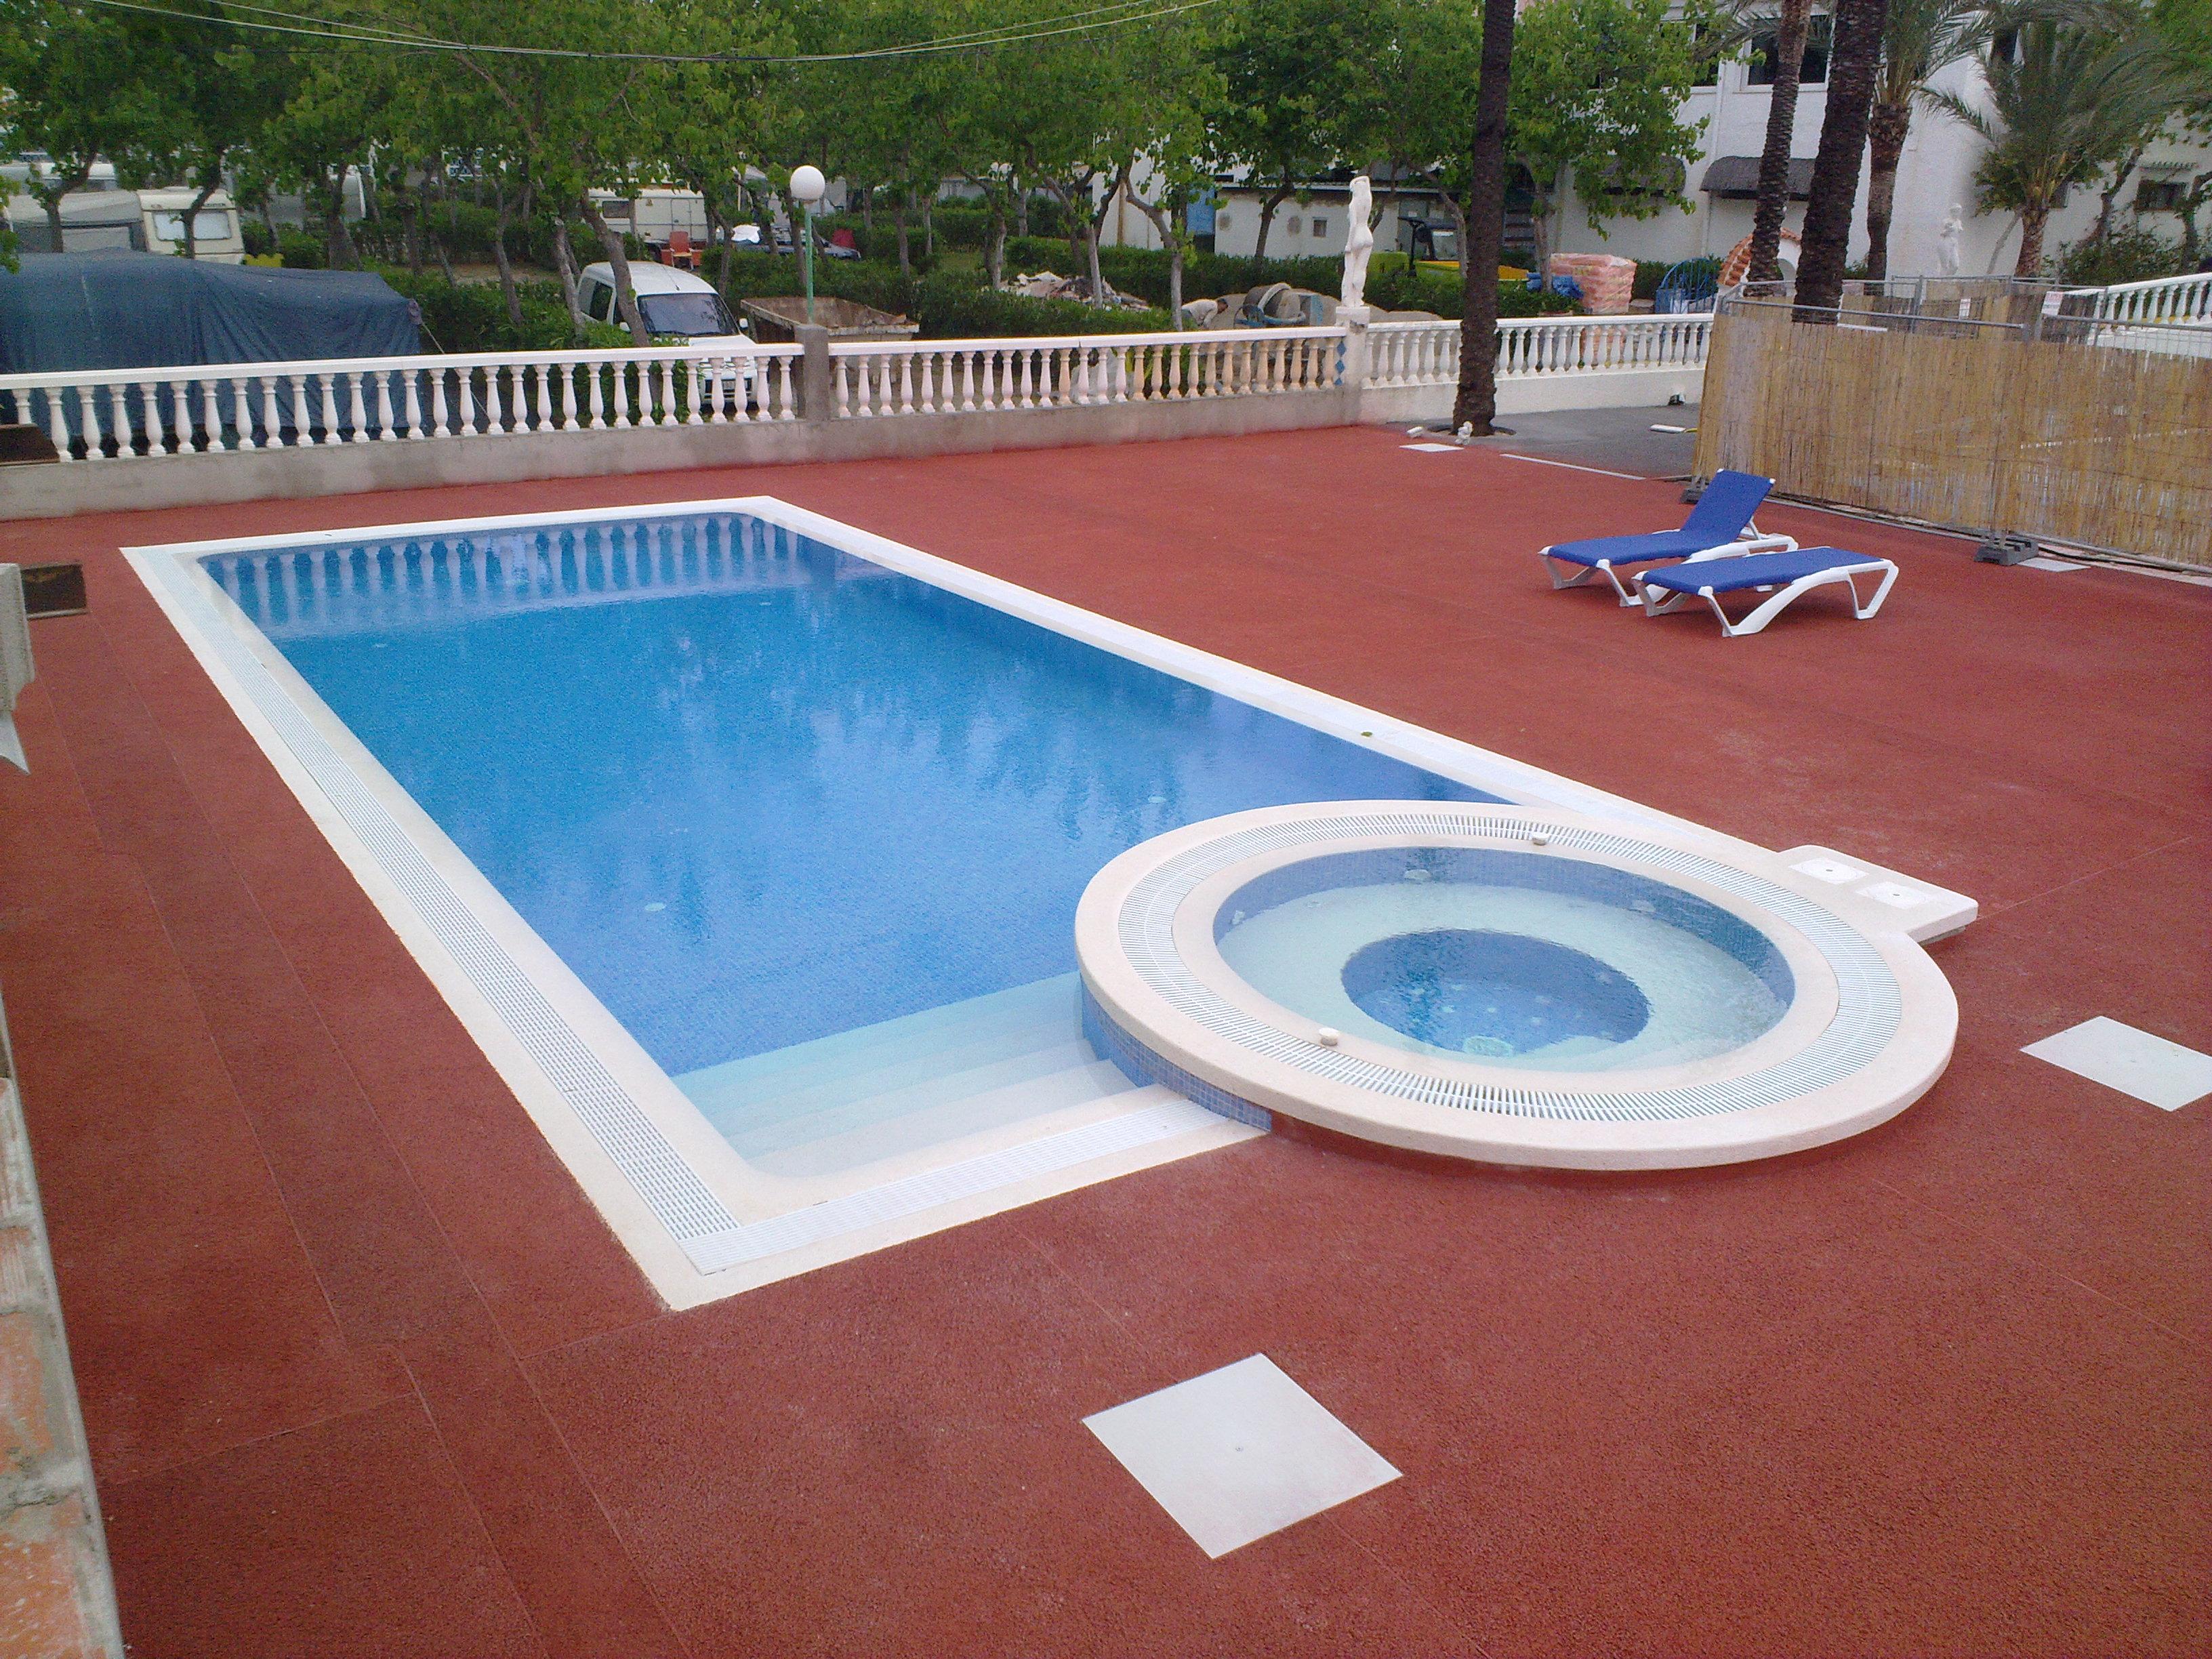 Piscinas suinco castellon de la plana castellon de la for Suministros para piscinas